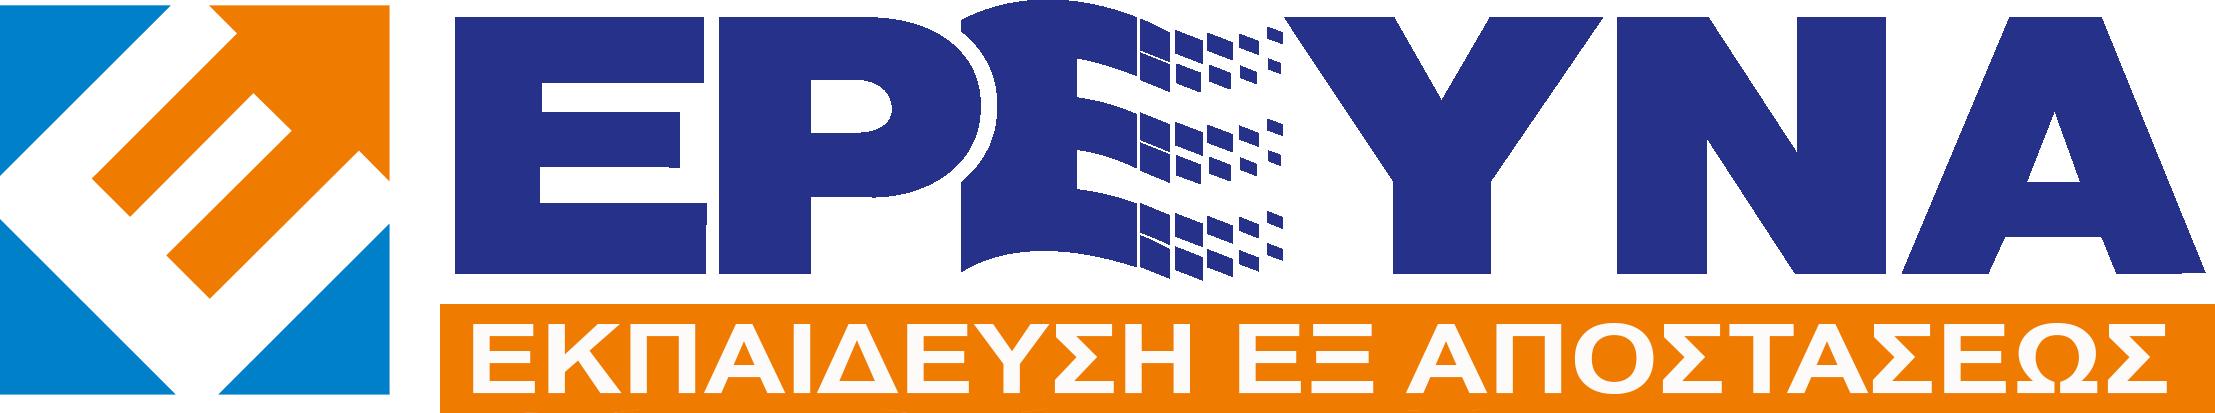 EREYNA_Elearning